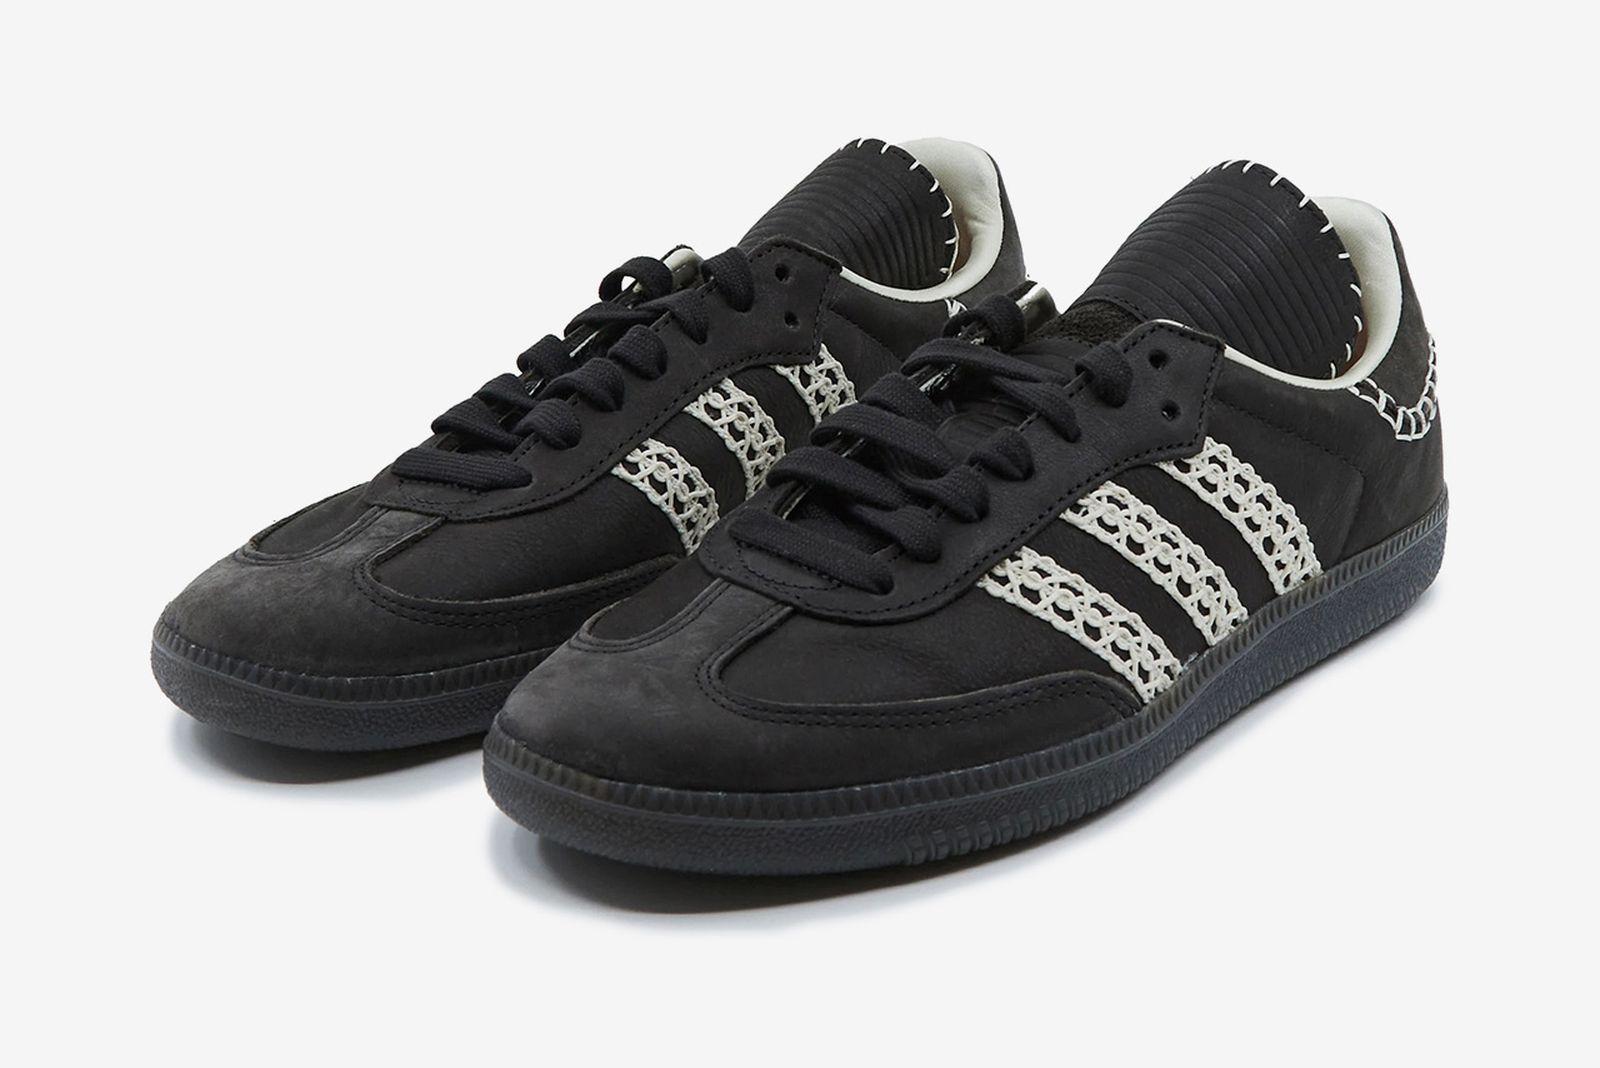 wales-bonner-adidas-originals-samba-release-date-price-01